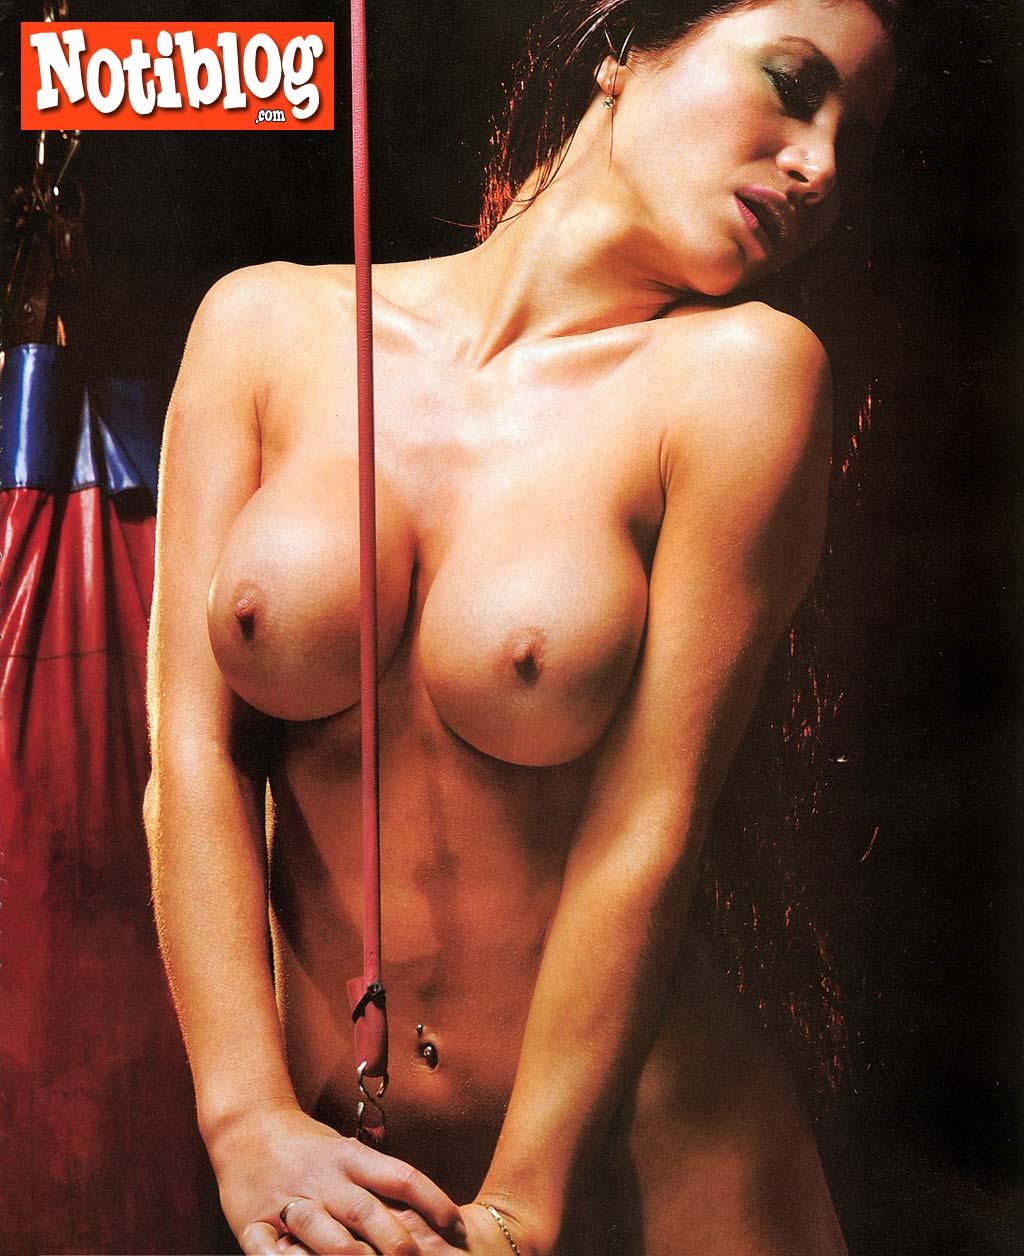 from Sullivan vickie guerrero playboy nude